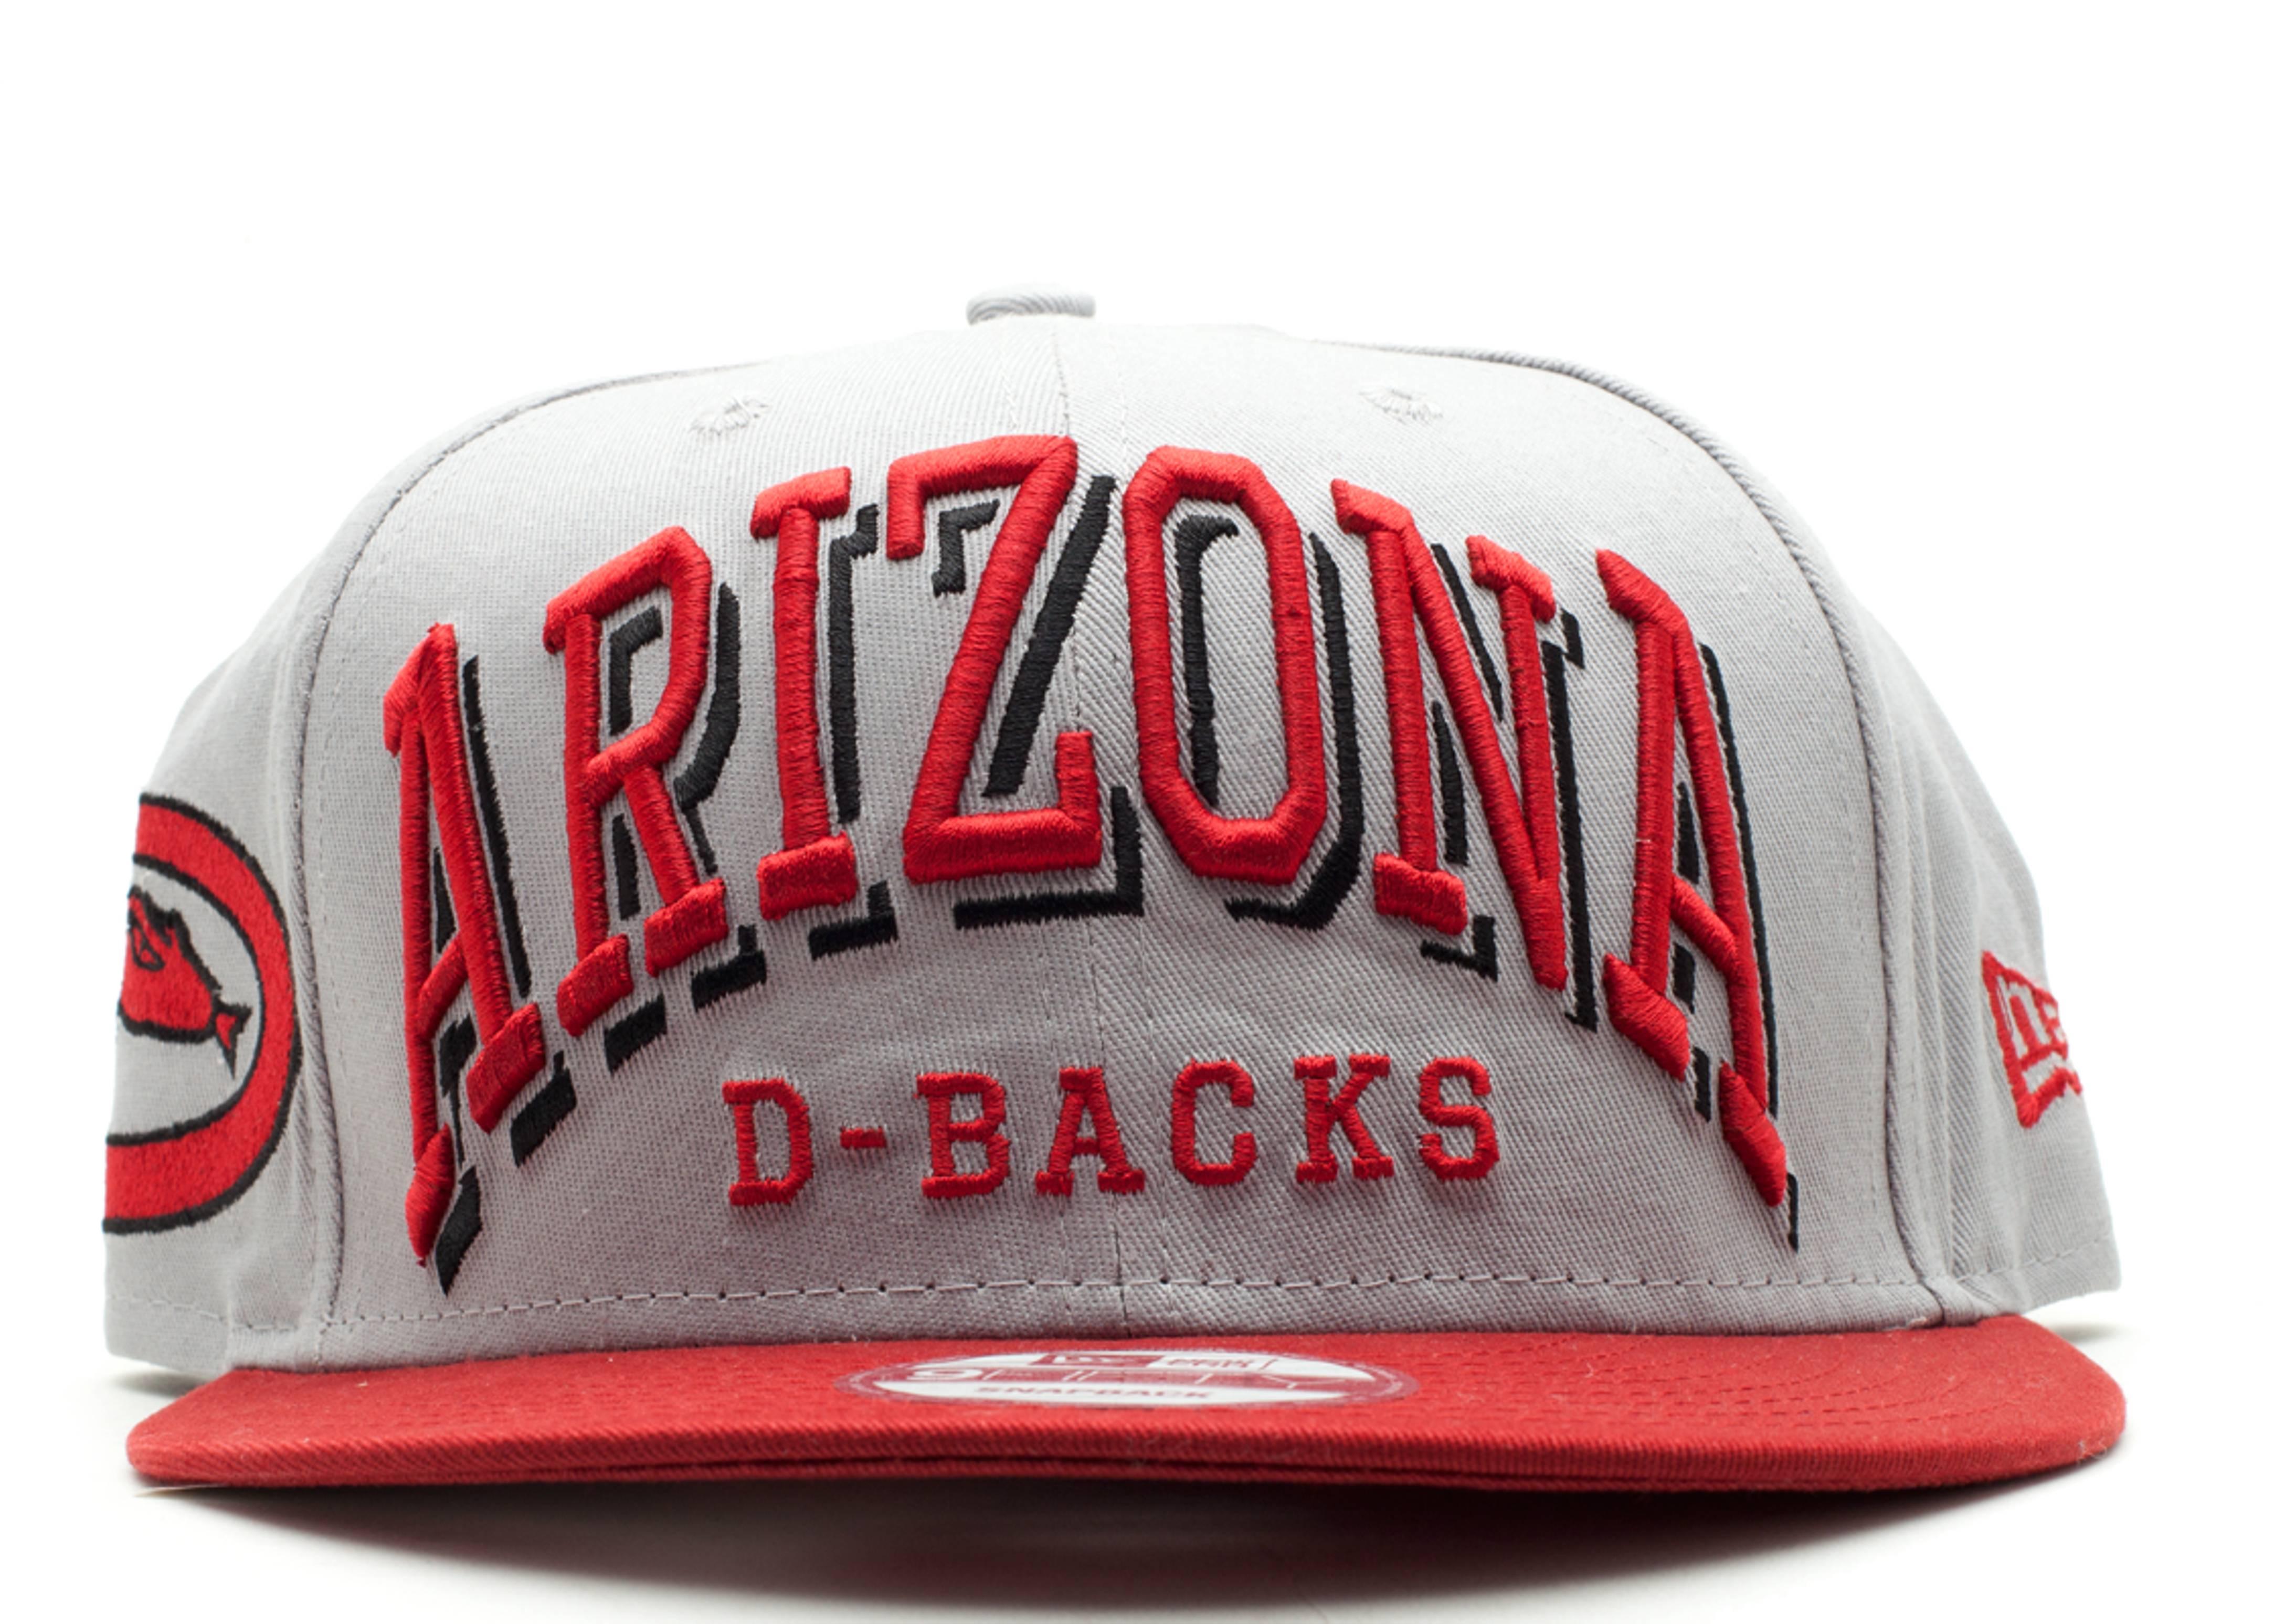 arizona diamondbacks snap-back